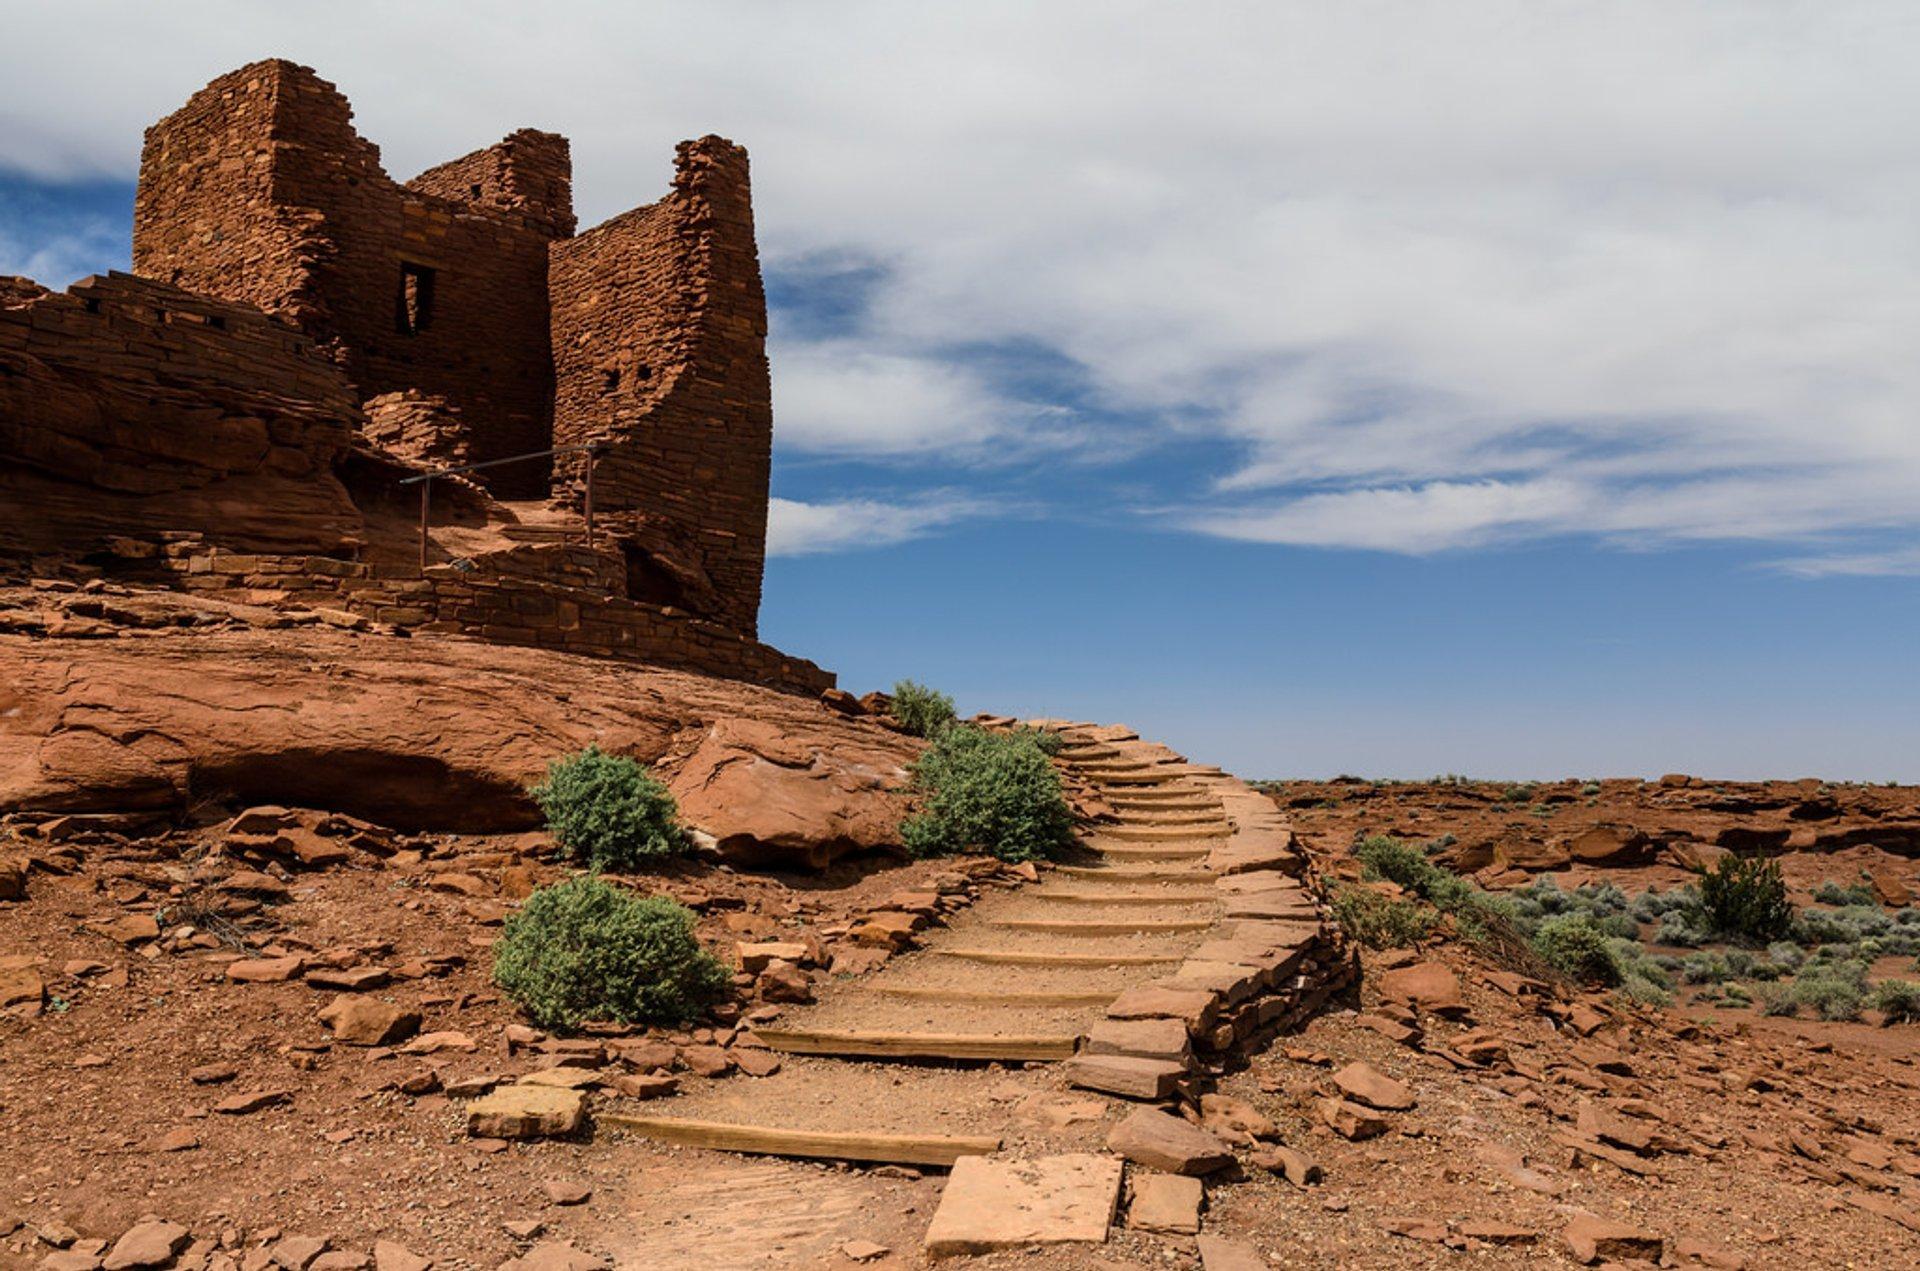 Wupatki National Monument in Arizona 2019 - Best Time